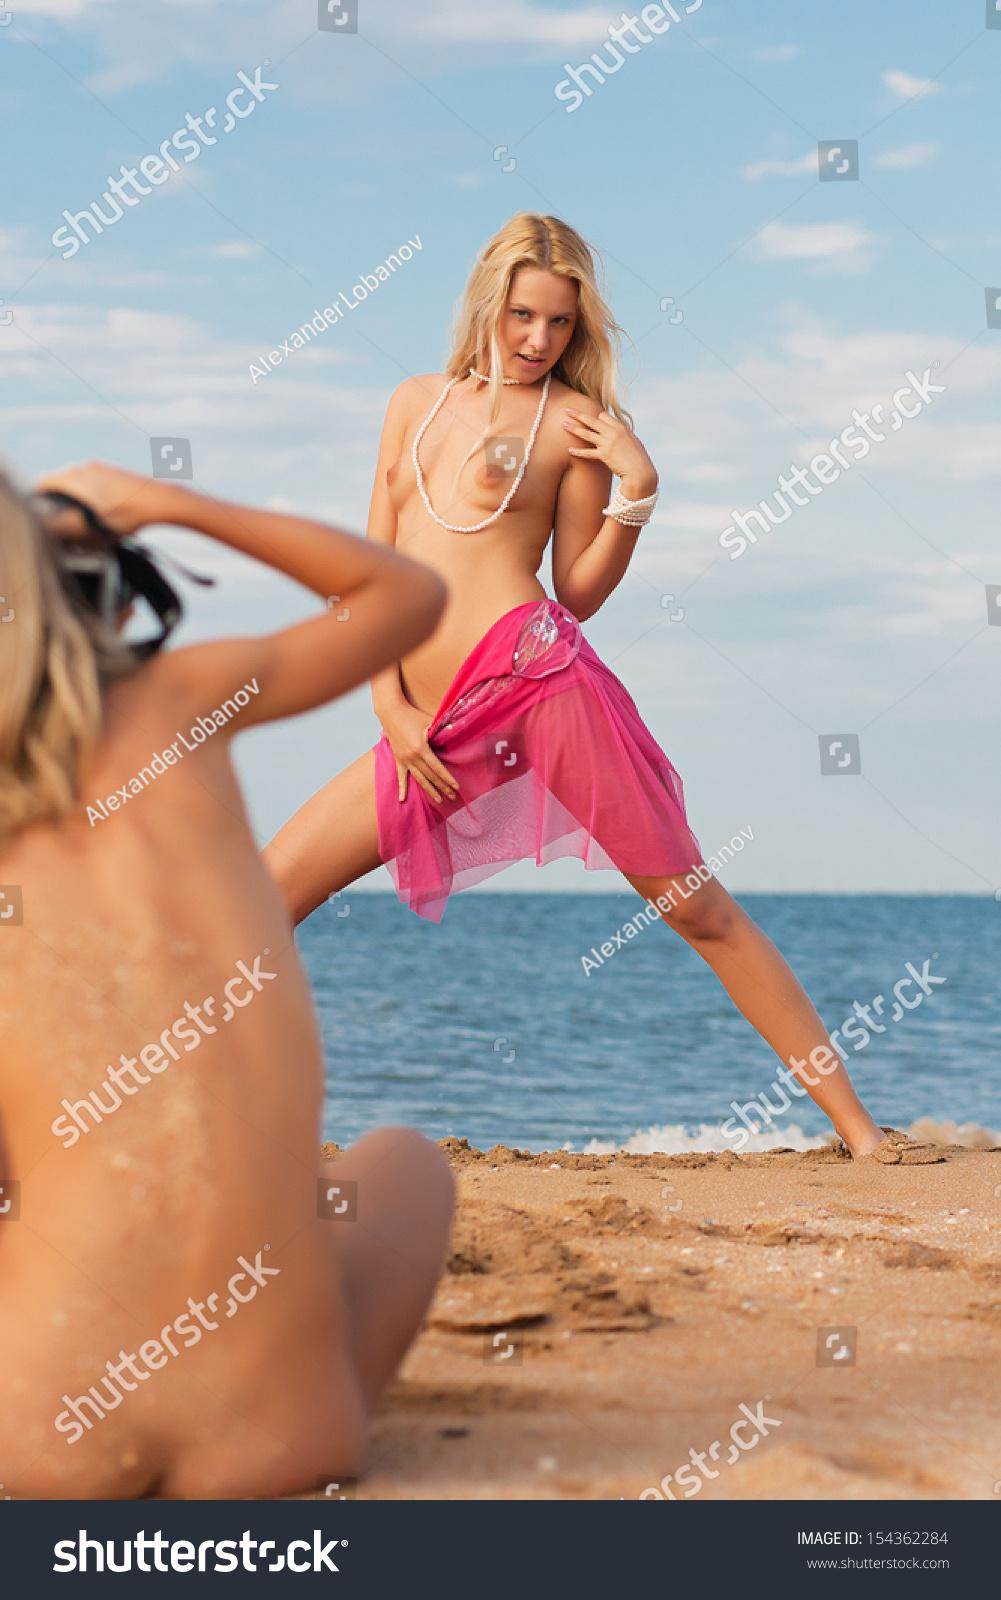 Naked girl posing on the beach nude girl photographer.